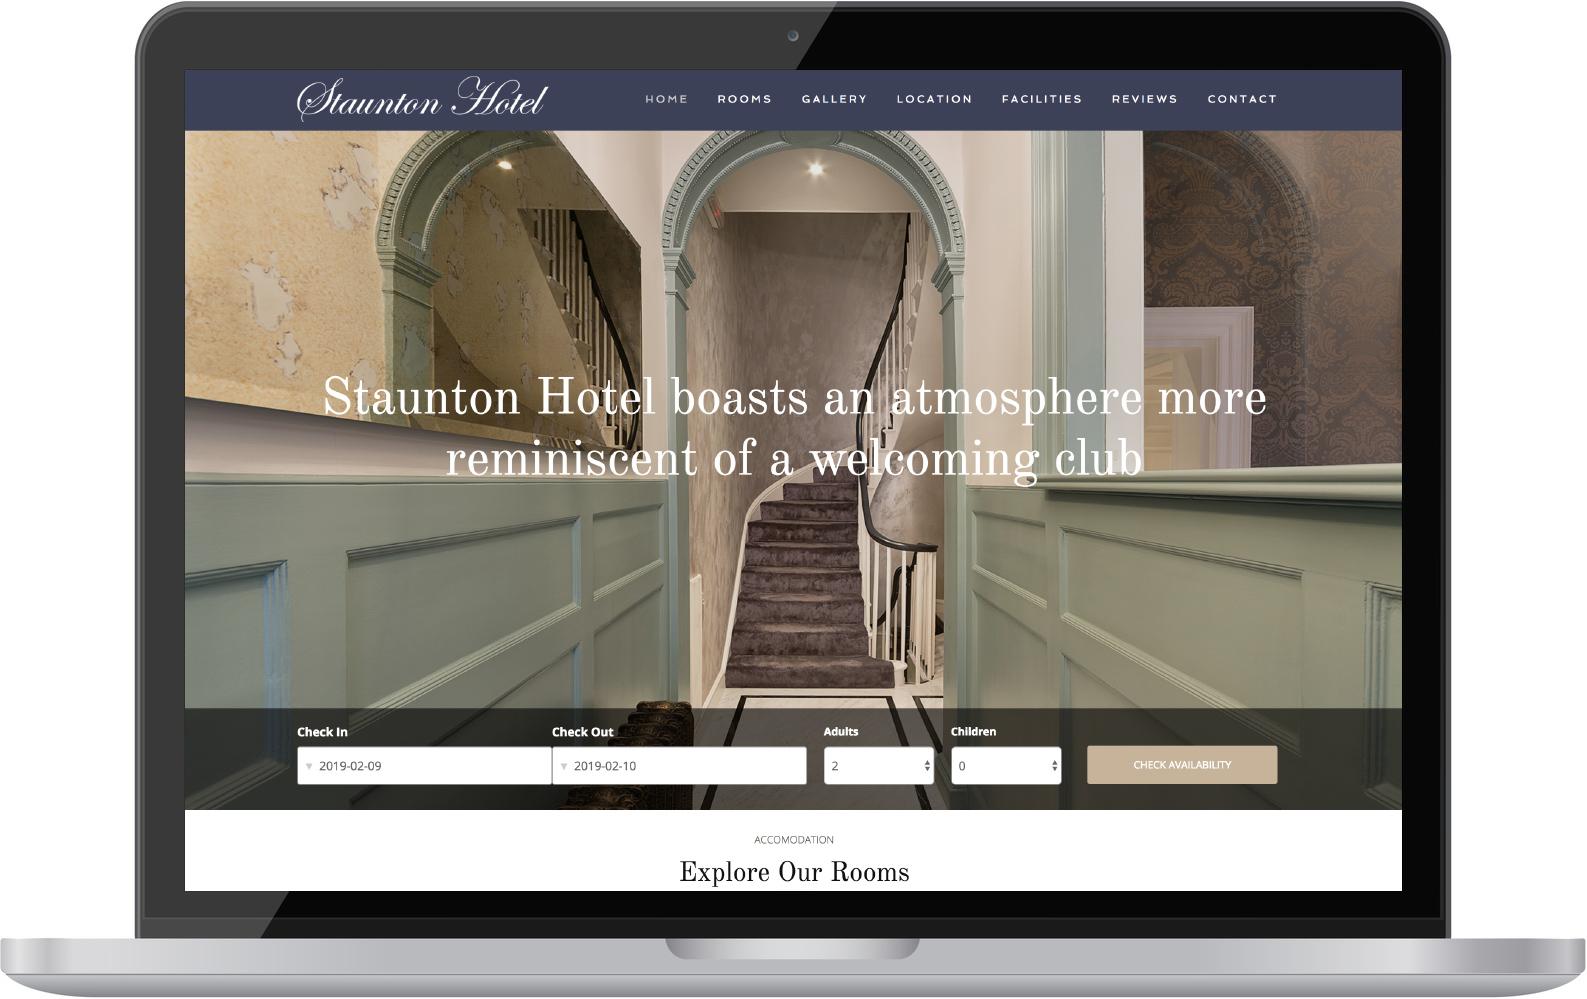 Staunton Hotel